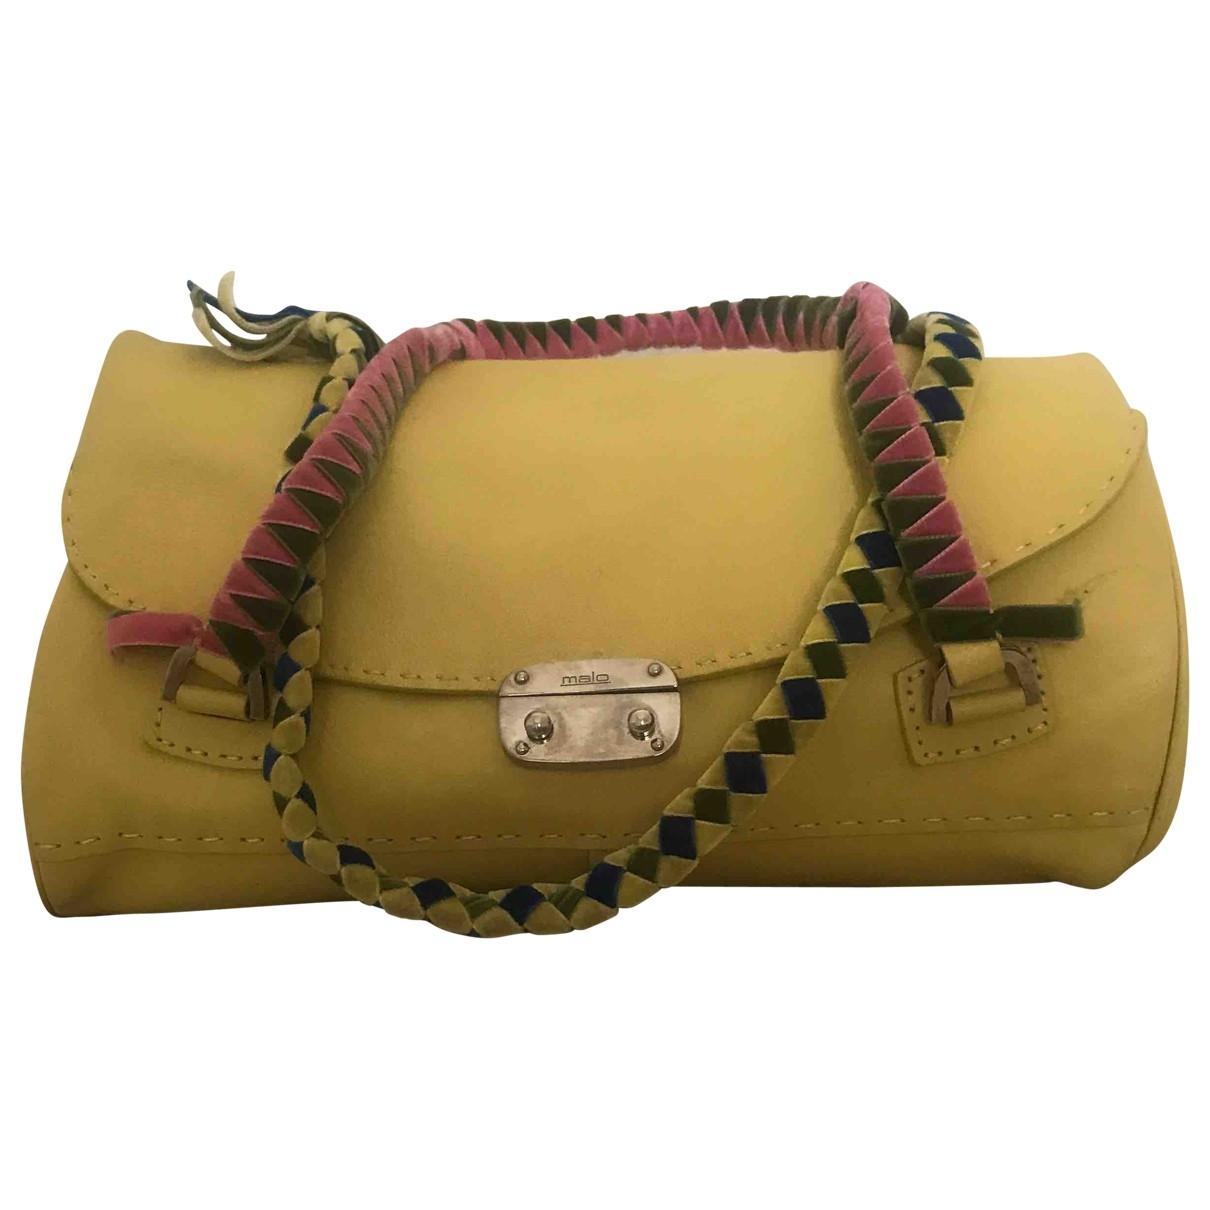 Malo \N Handtasche in  Gelb Leder